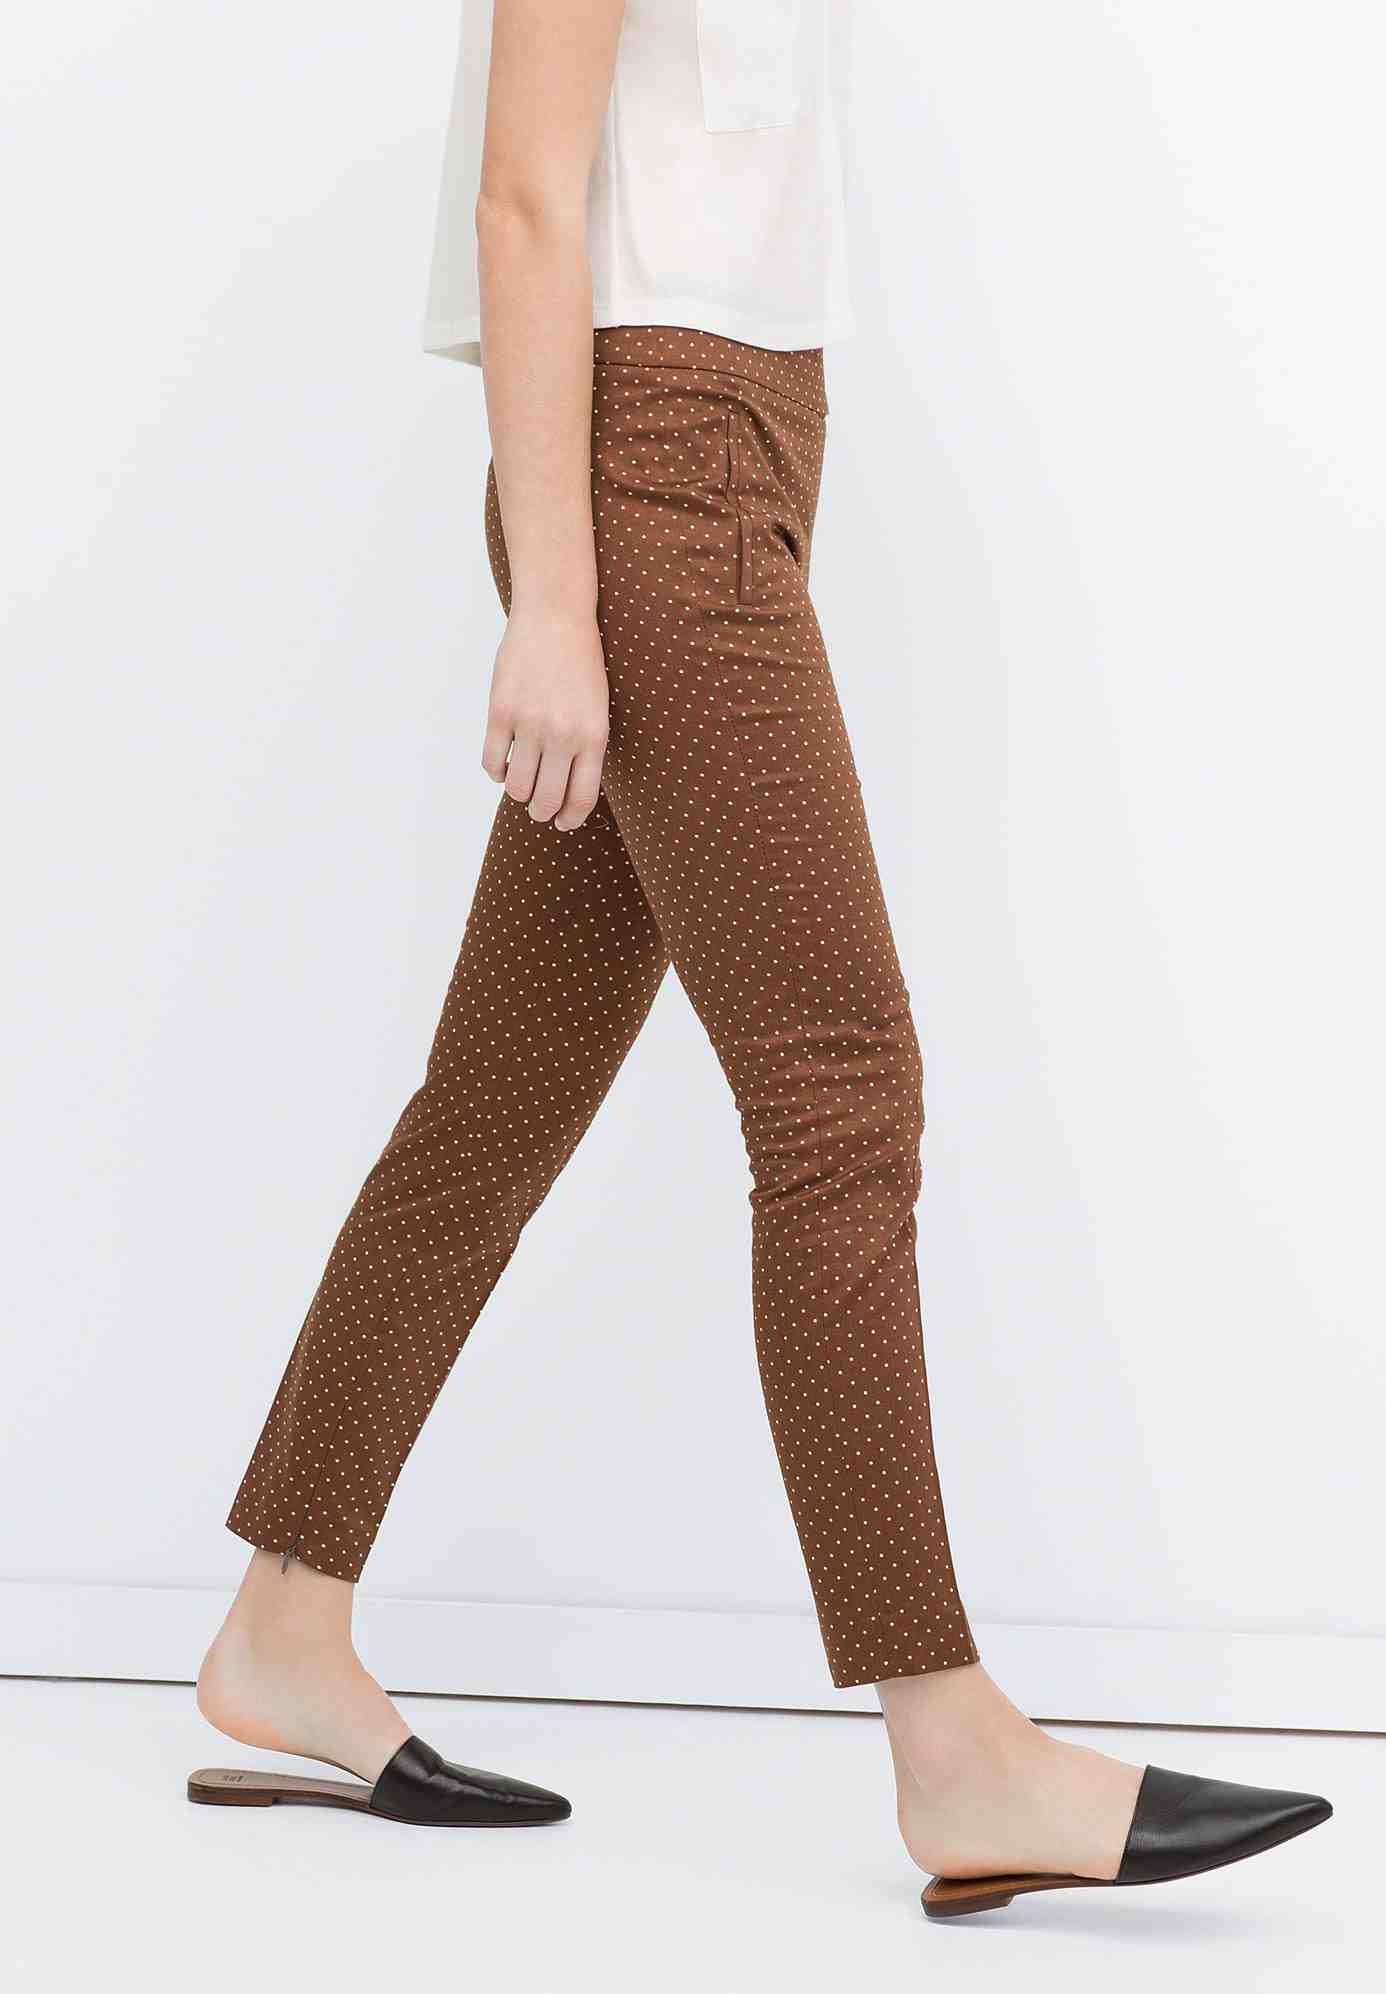 Zara - Pantalon(30 €)